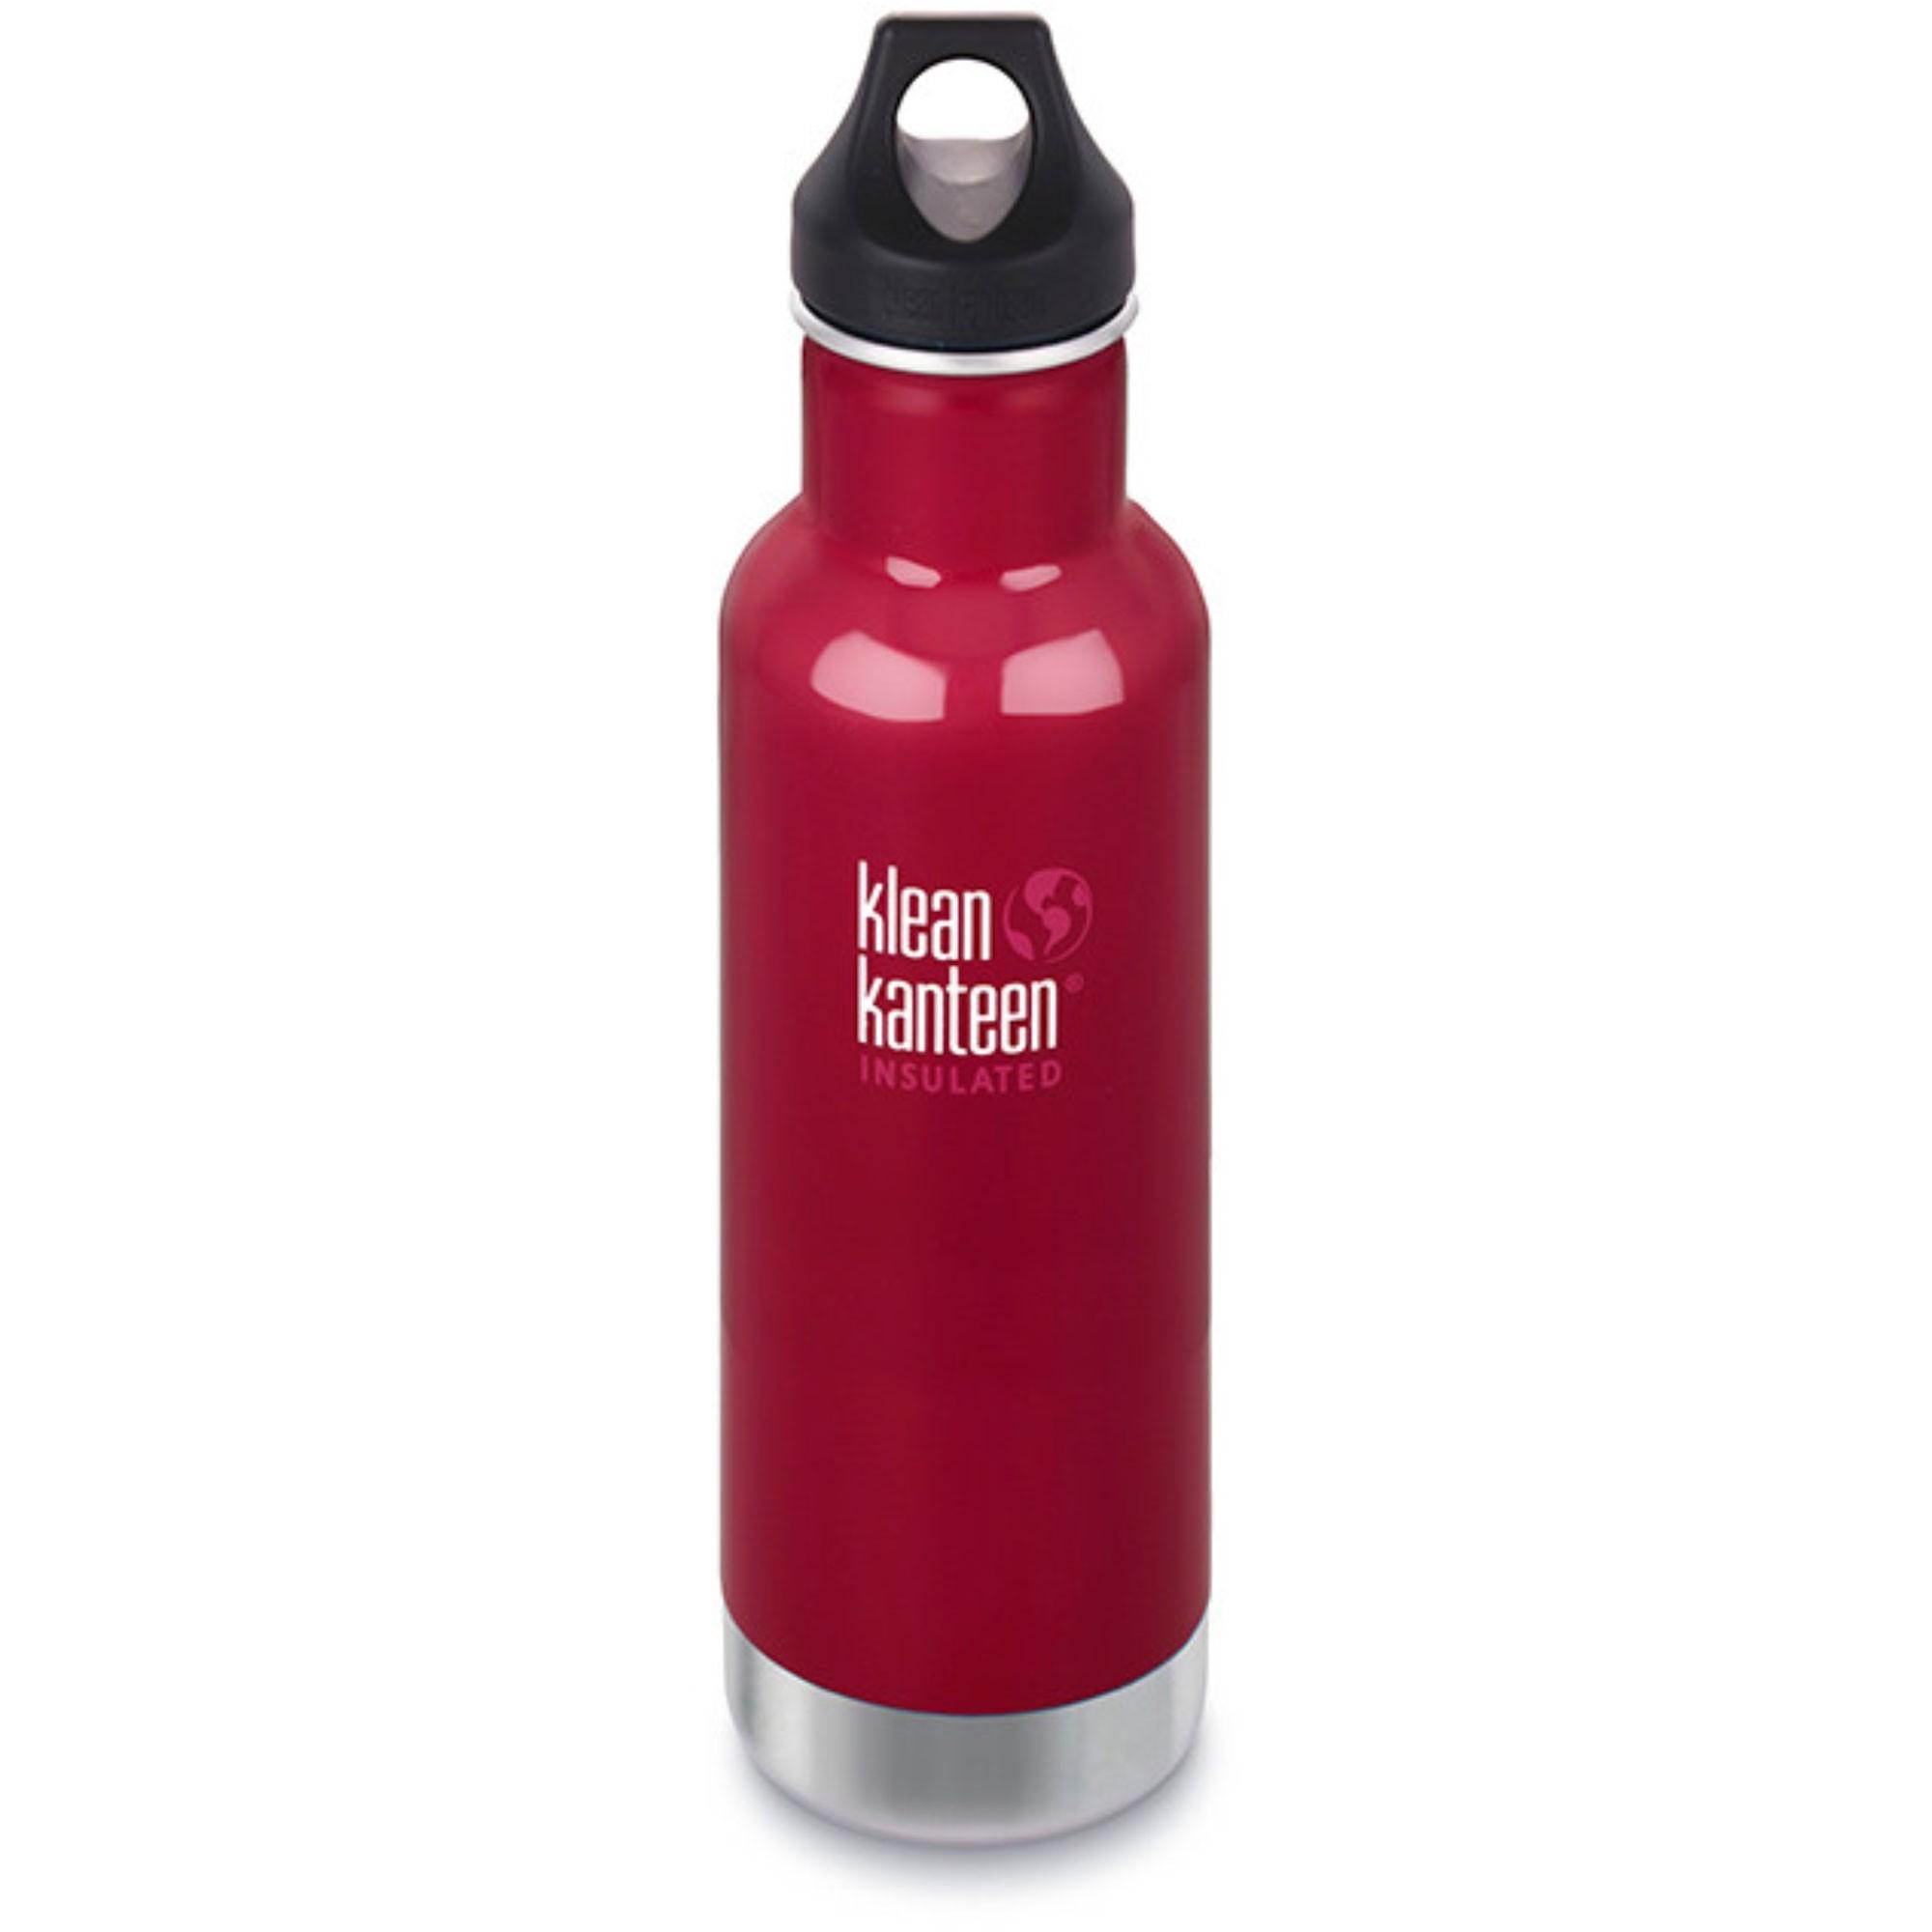 KLEAN KANTEEN - Classic Insulated Flask - 592ml - Beet Root